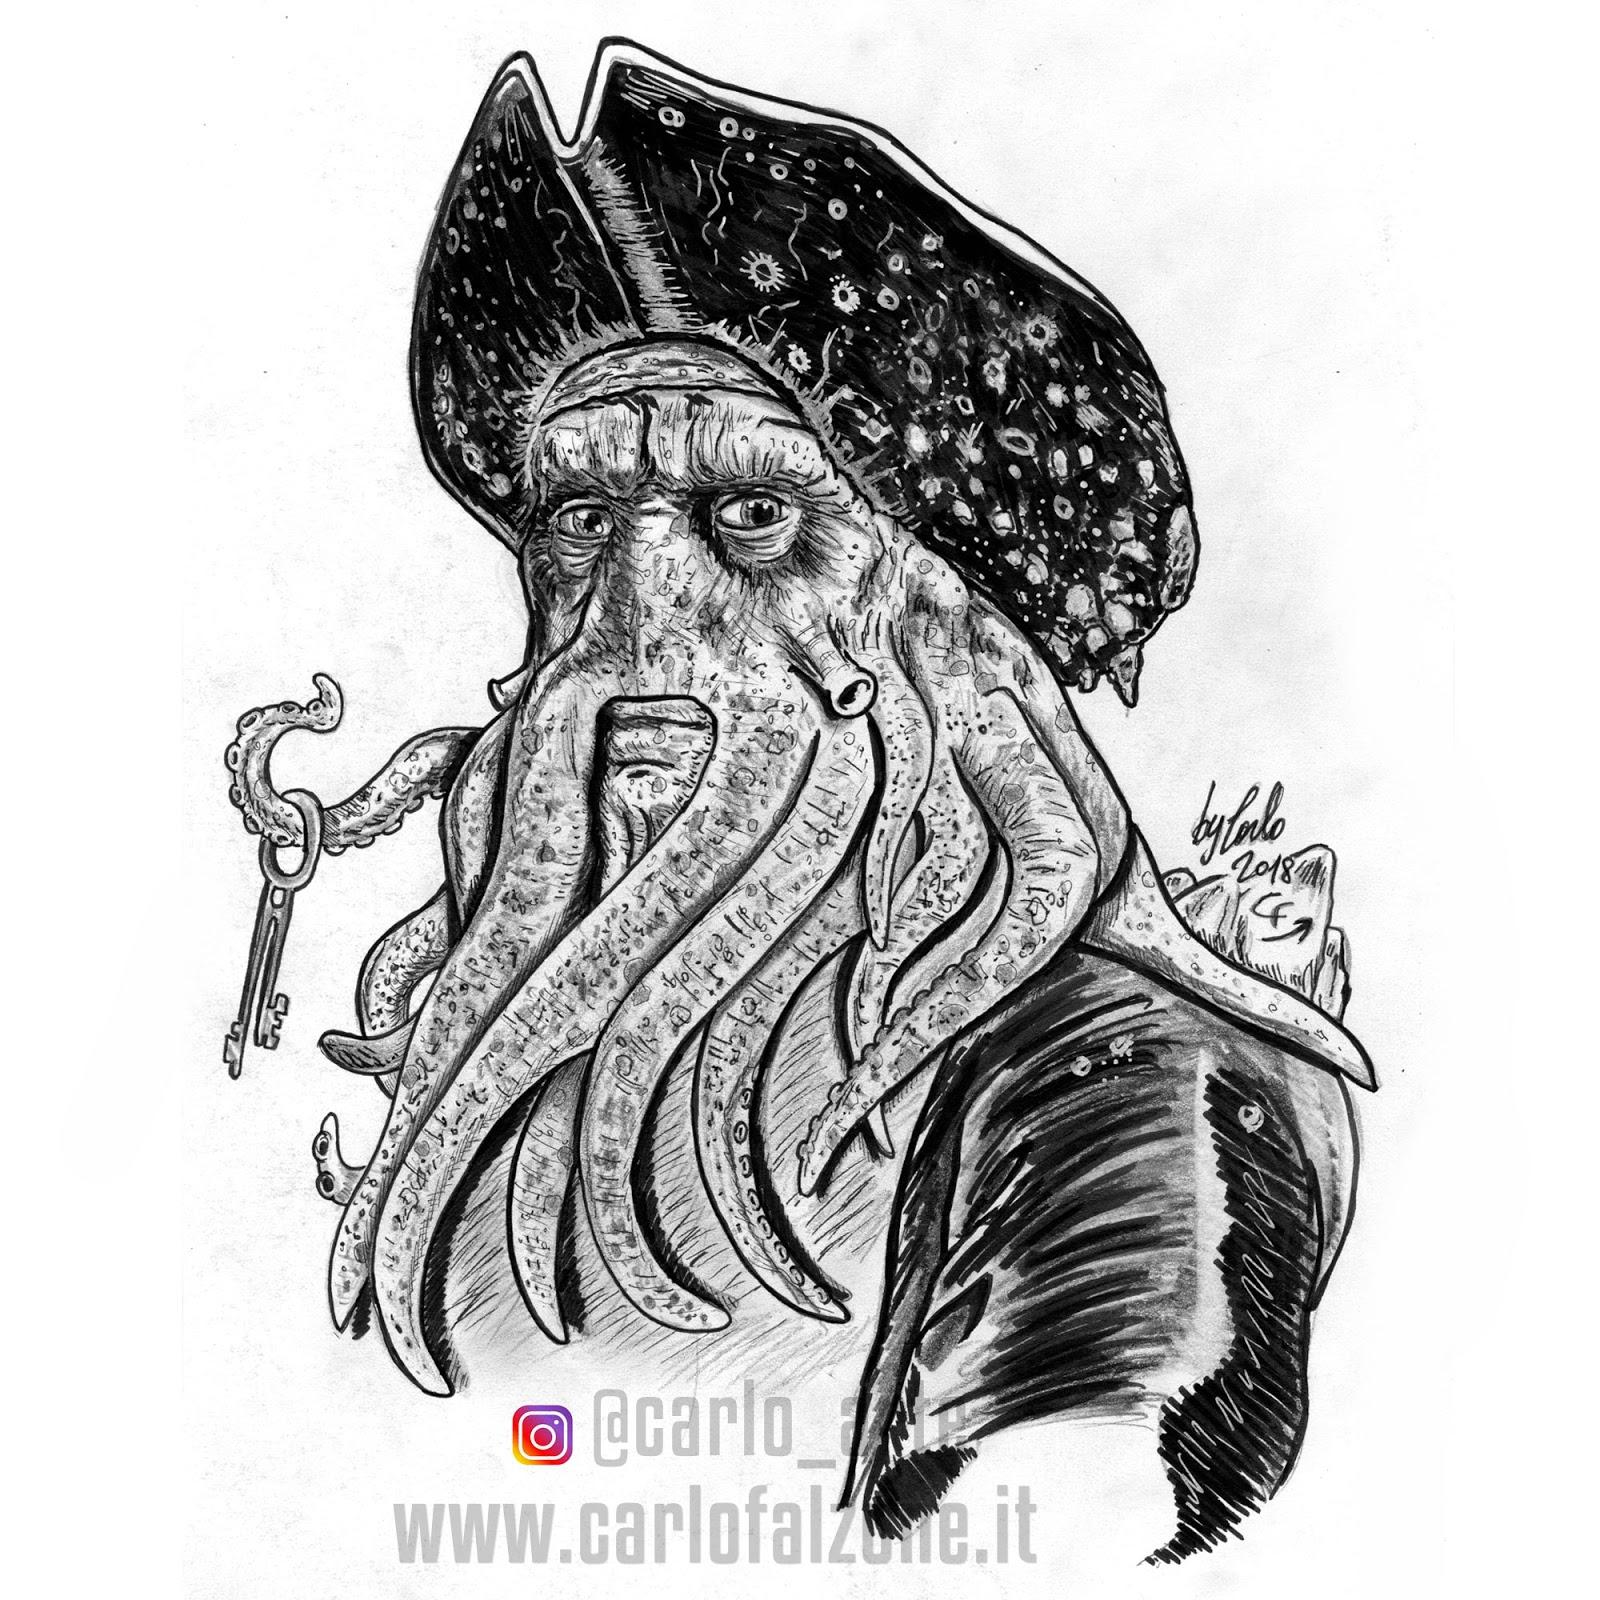 Pirati Dei Caraibi Disegno.Carlo Falzone Davy Jones I Pirati Dei Caraibi